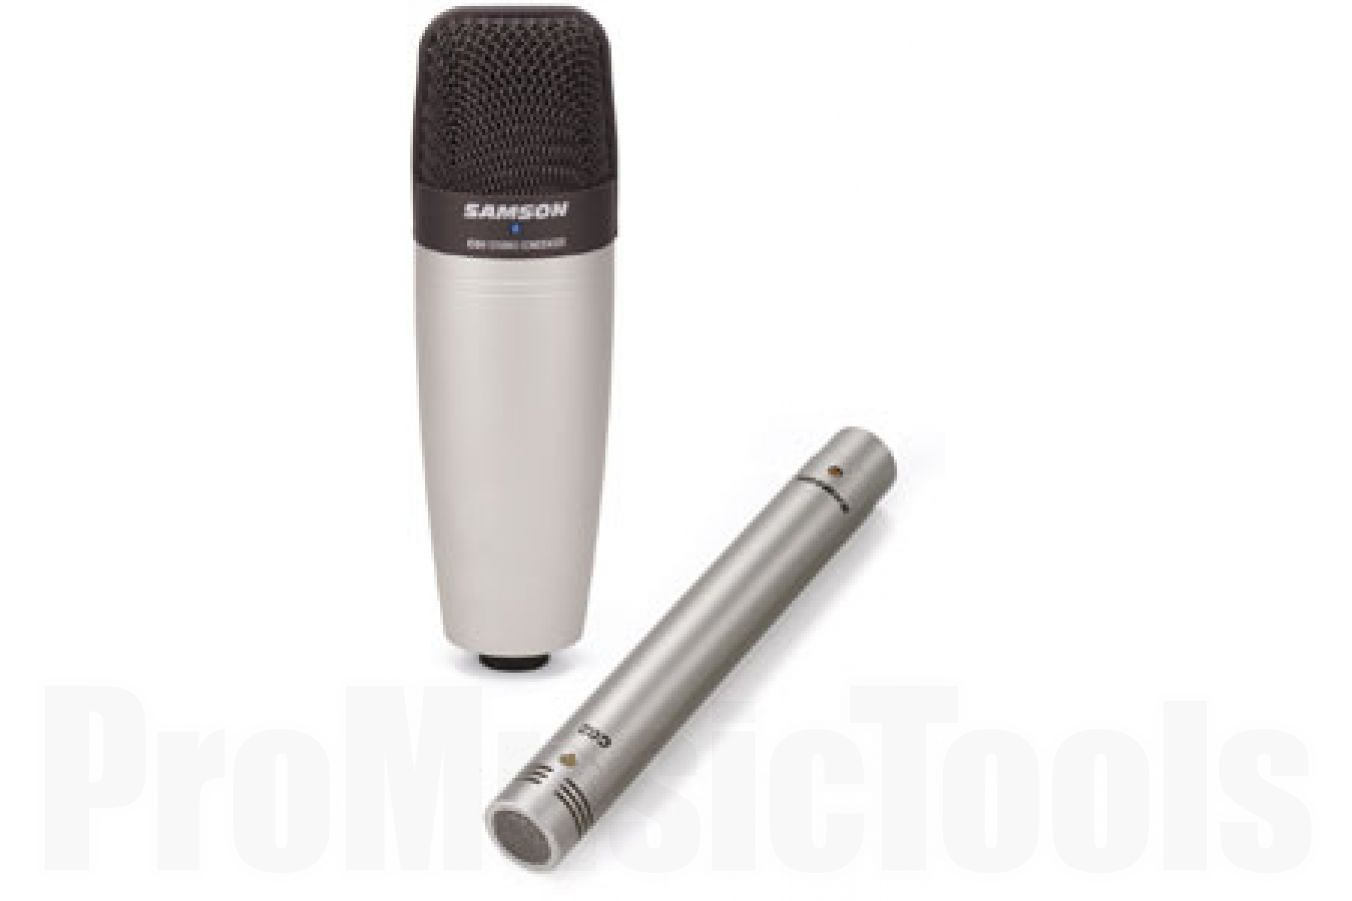 Samson C01/C02 Concert Line Condenser Microphone Package